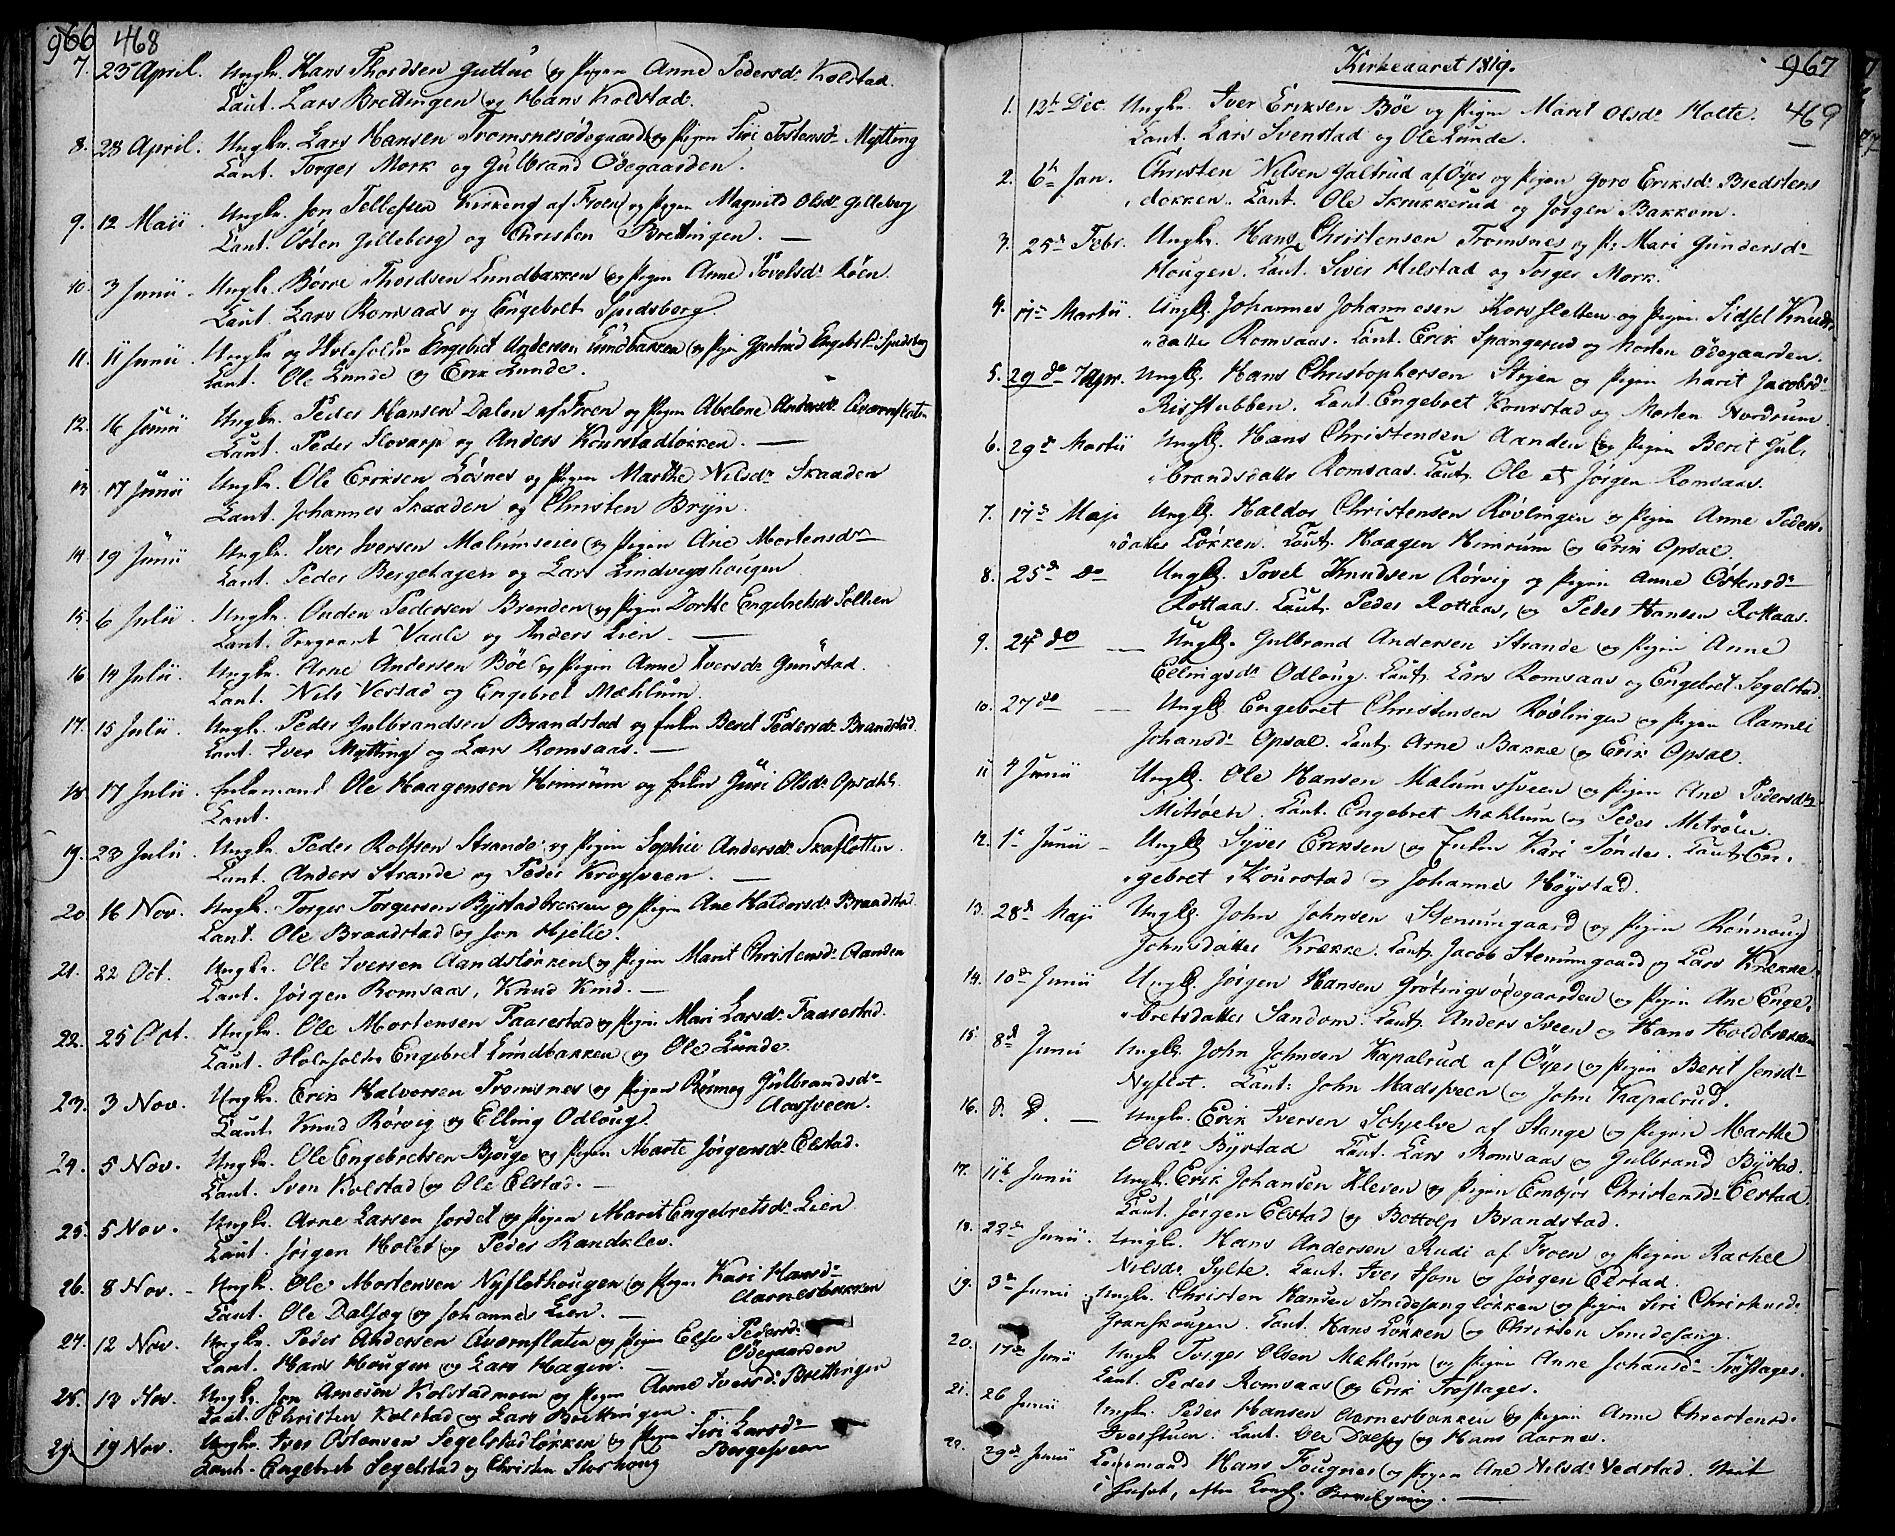 SAH, Ringebu prestekontor, Ministerialbok nr. 3, 1781-1820, s. 468-469